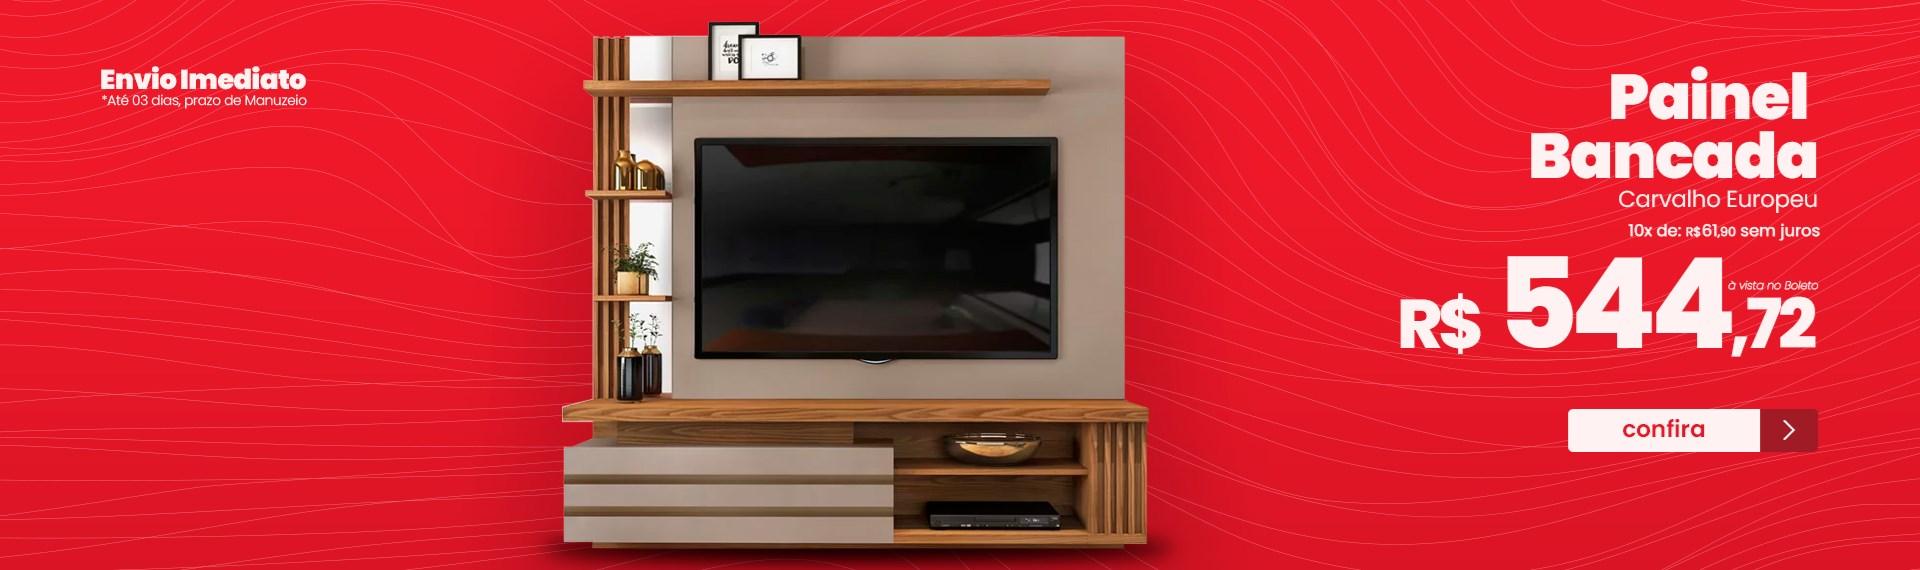 Painel Bancada Para TV 55